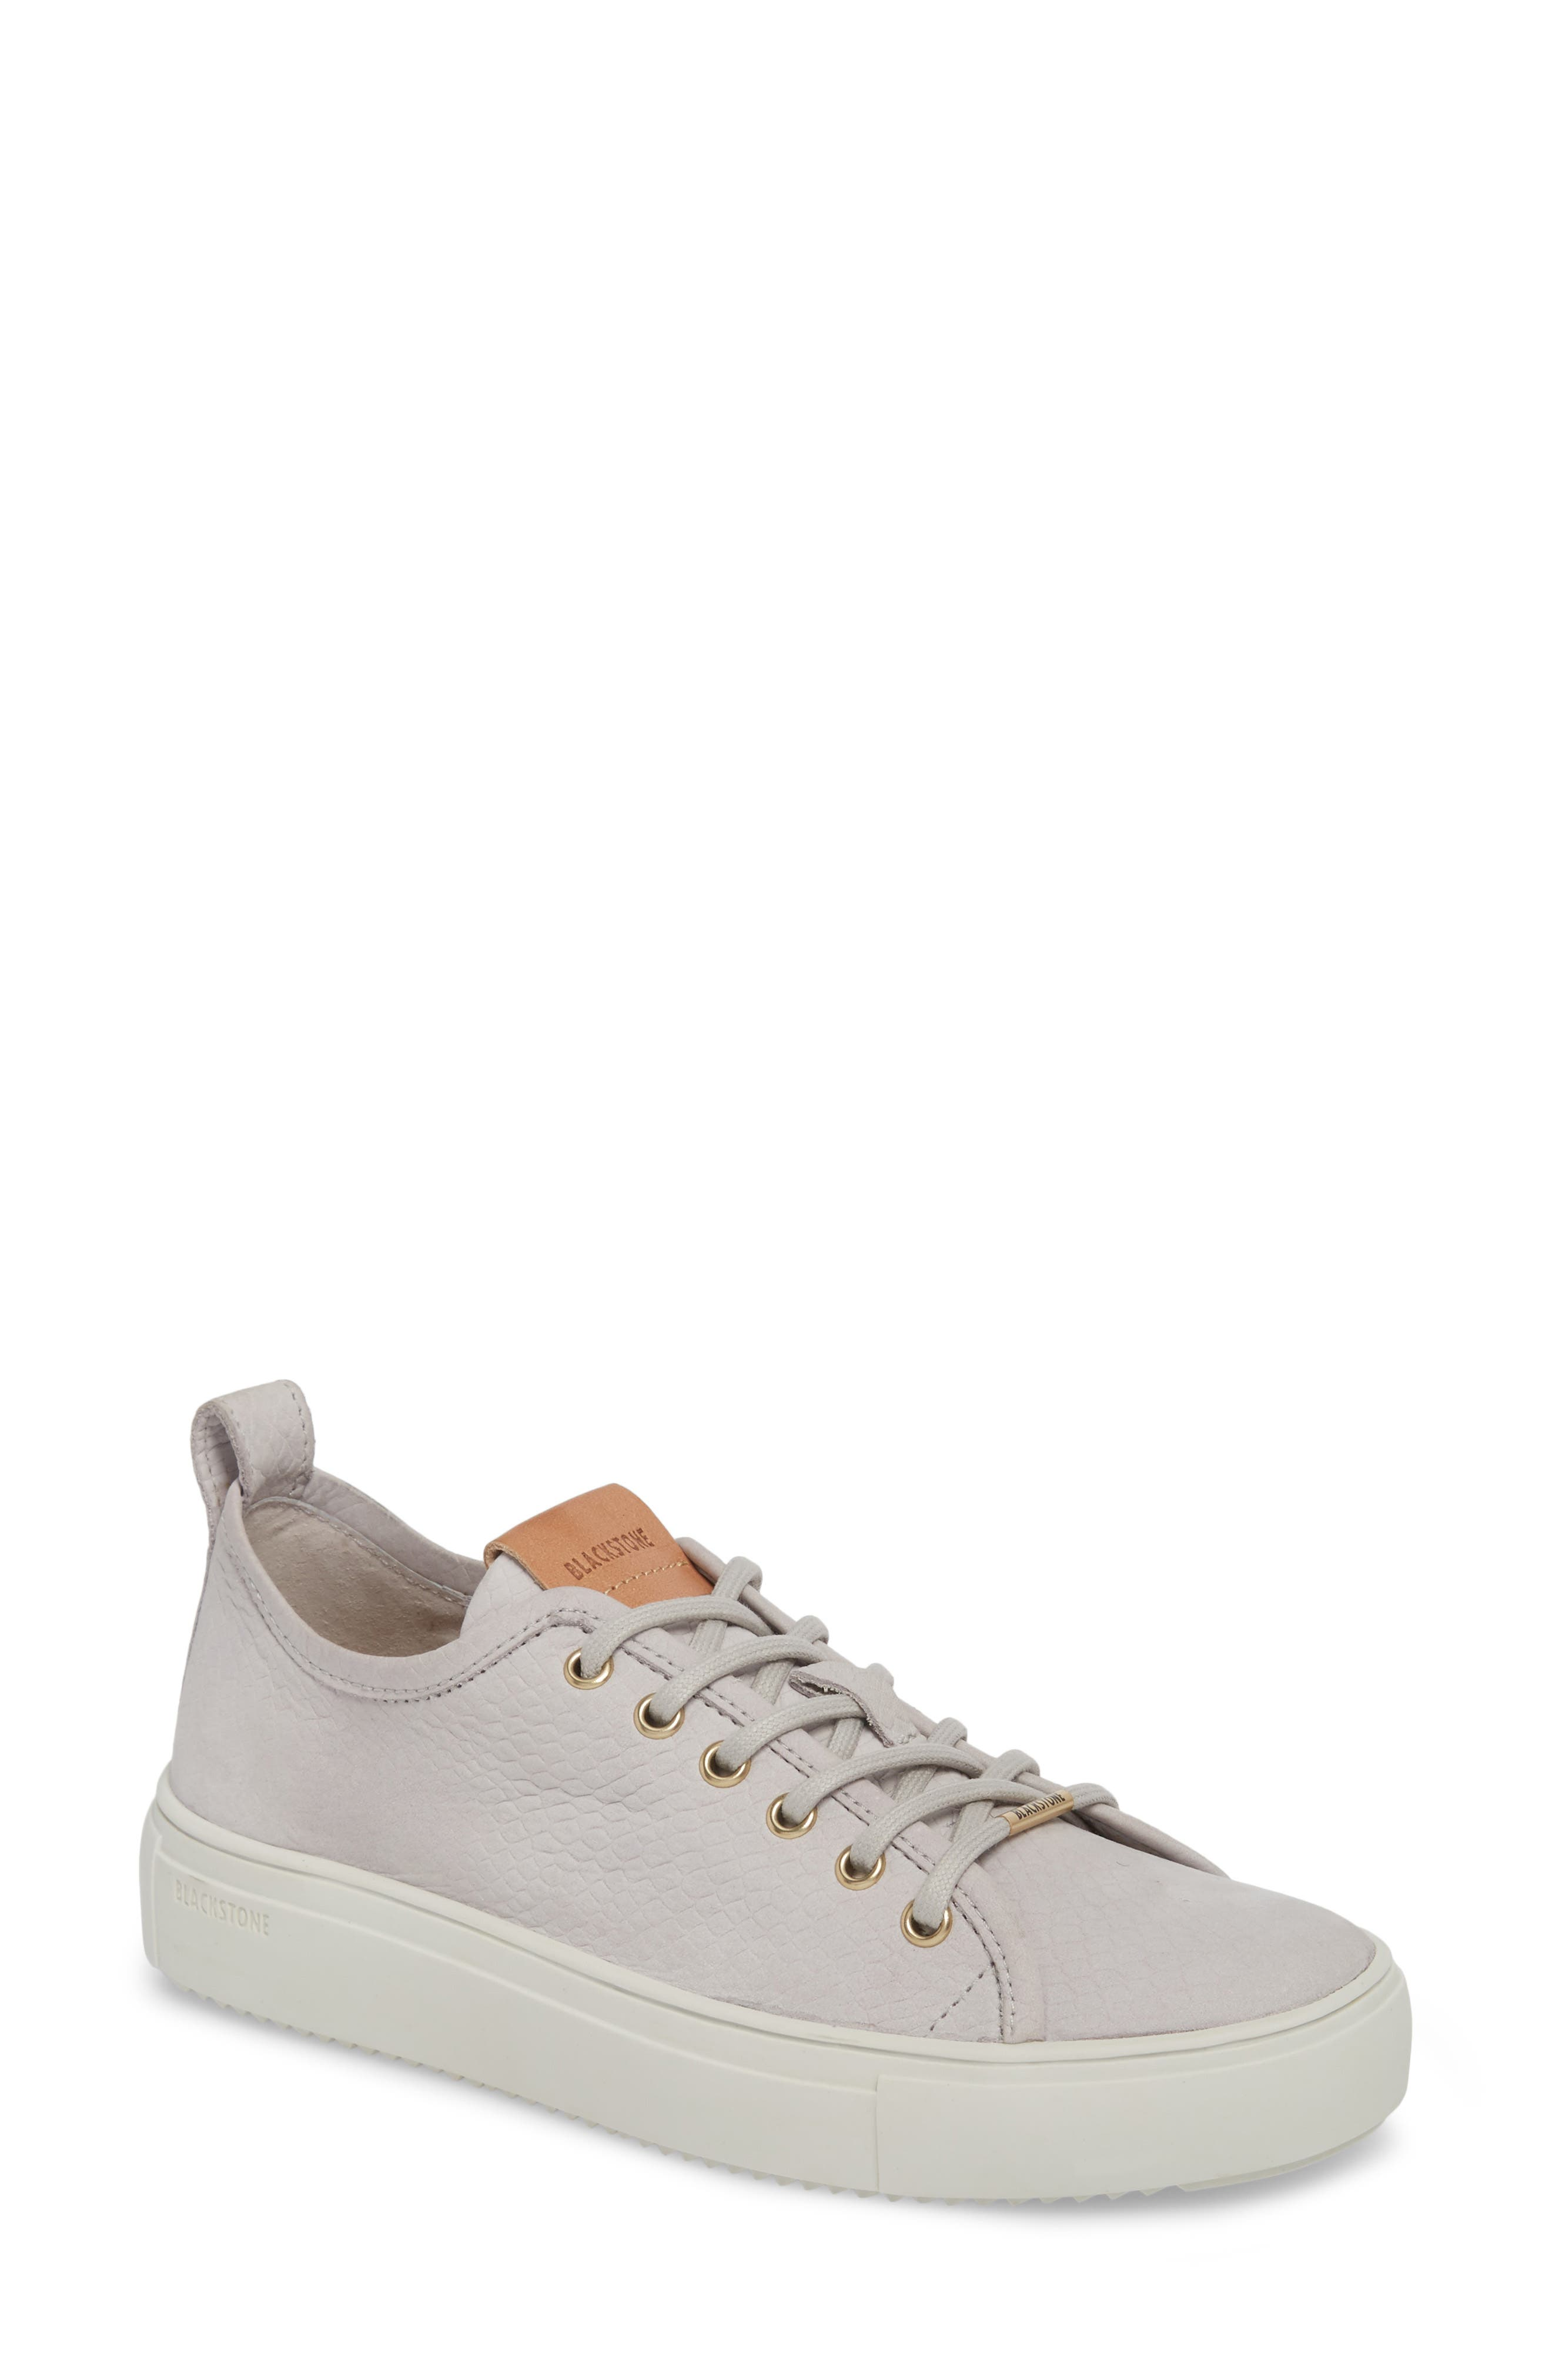 PL90 Sneaker,                             Main thumbnail 1, color,                             MYCRO CHIP LEATHER